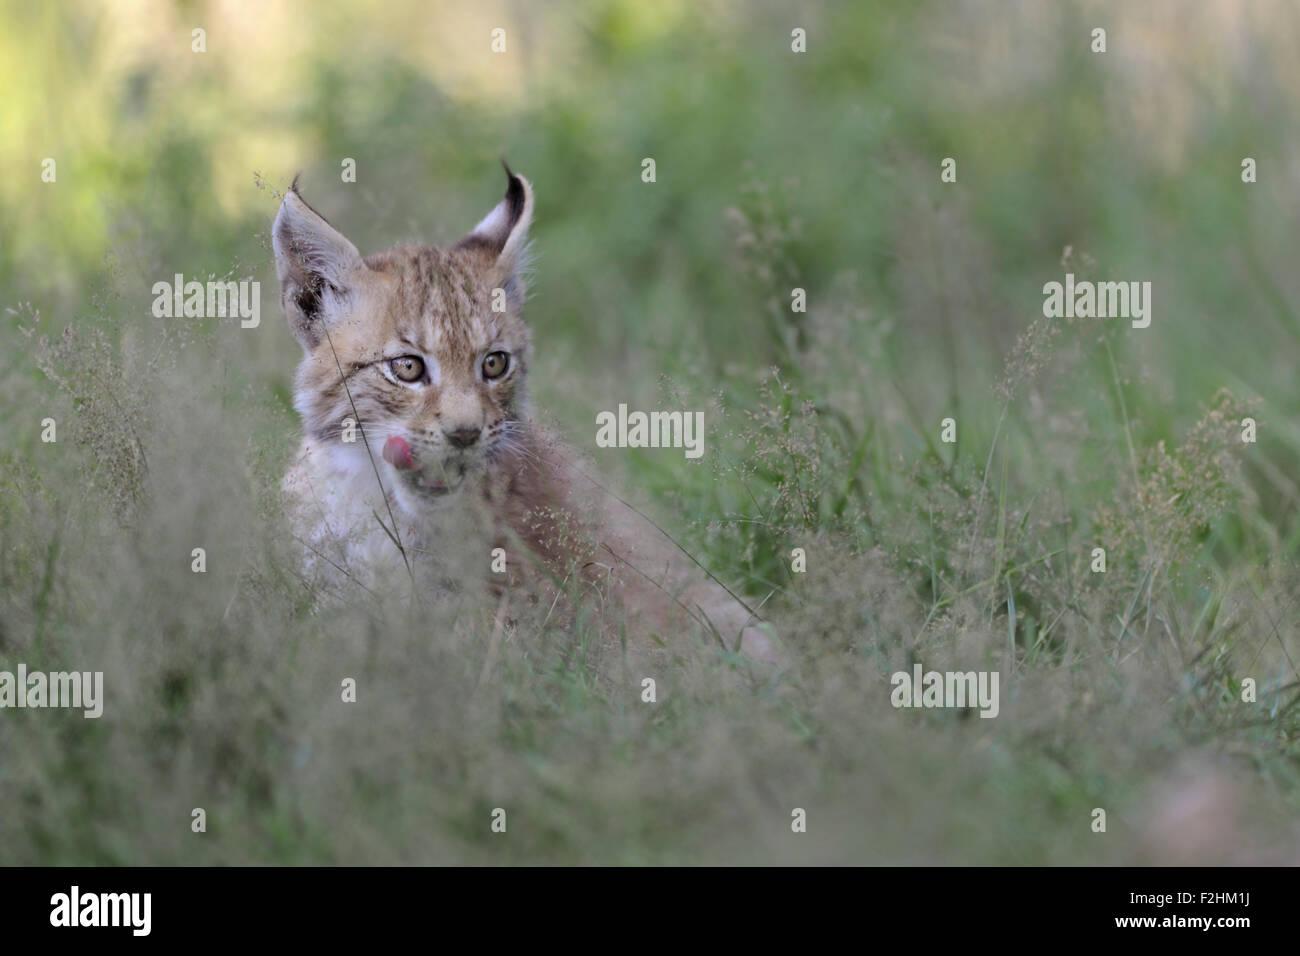 Young cub of Eurasian Lynx / Eurasischer Luchs ( Lynx lynx ) licks deceitful its tongue, looks funny. - Stock Image